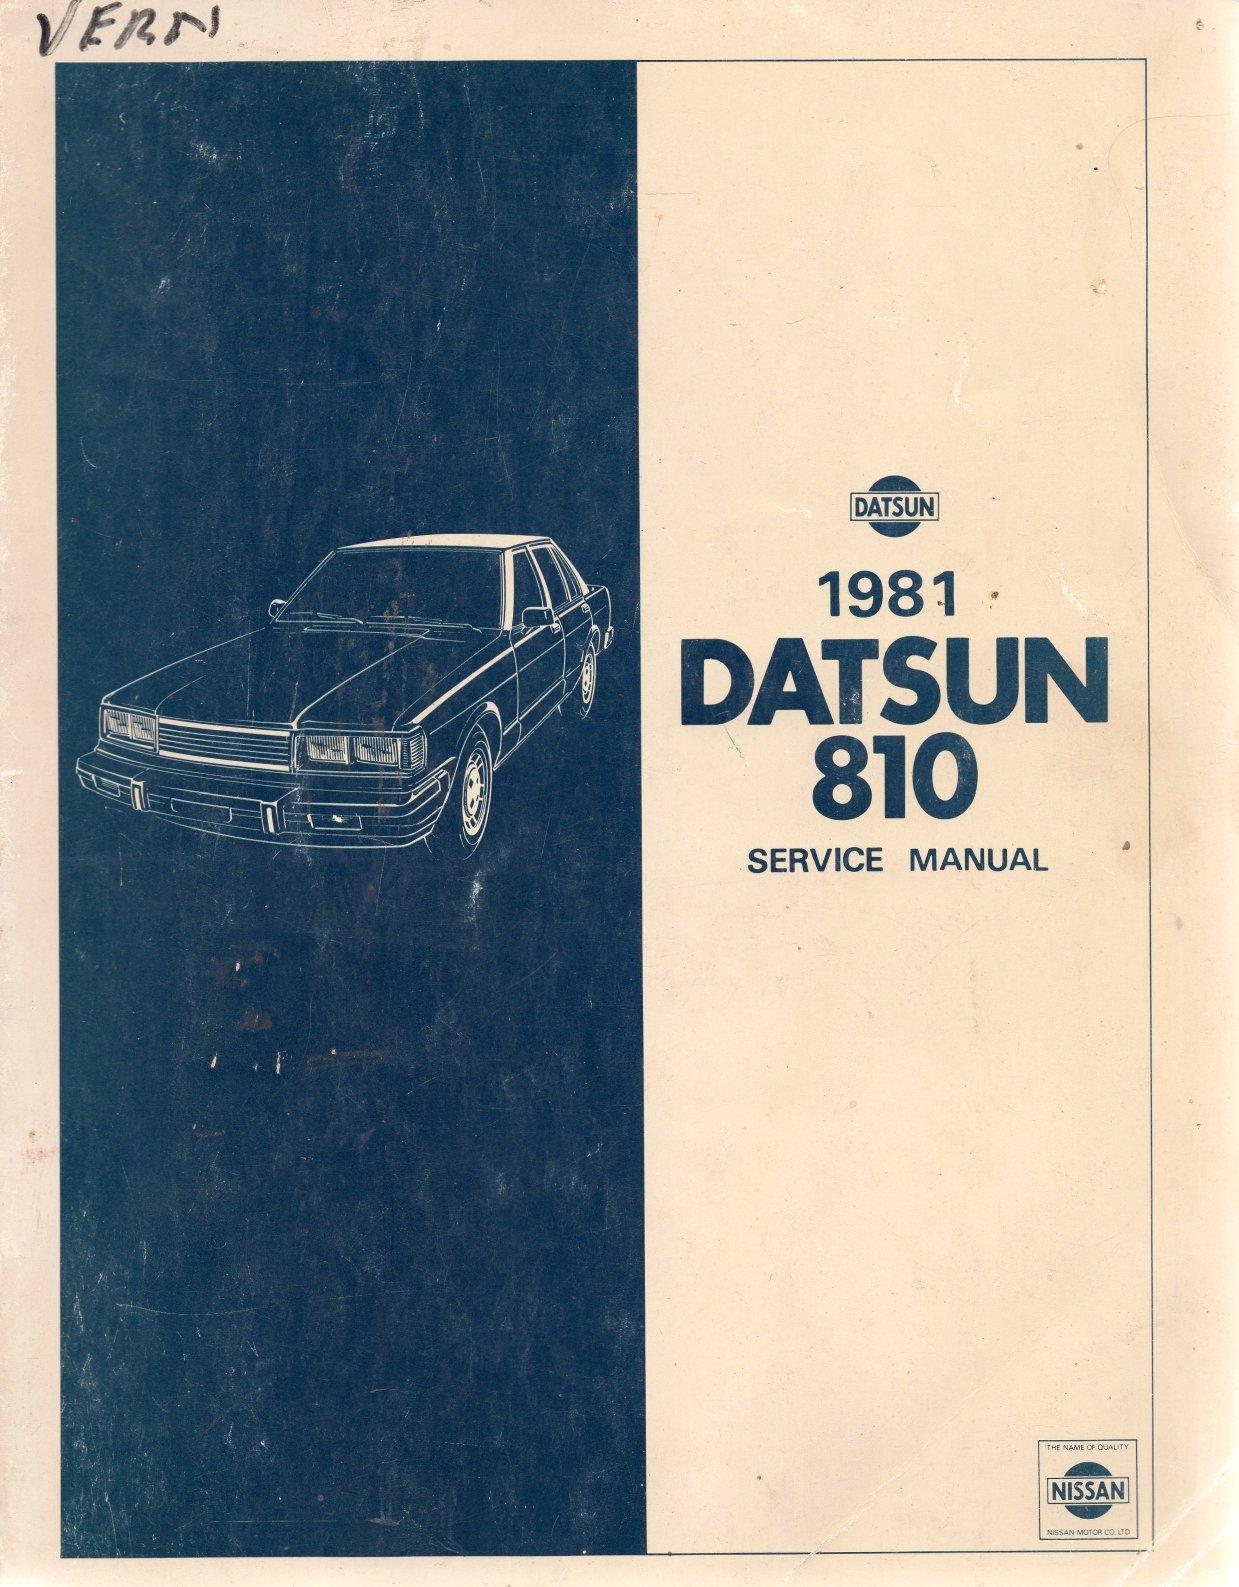 1981 Datsun 810 - Service Manual - Model 910 Series - Publication Number  SM1E-0910U0: Nissan Motor Co LTD: Amazon.com: Books